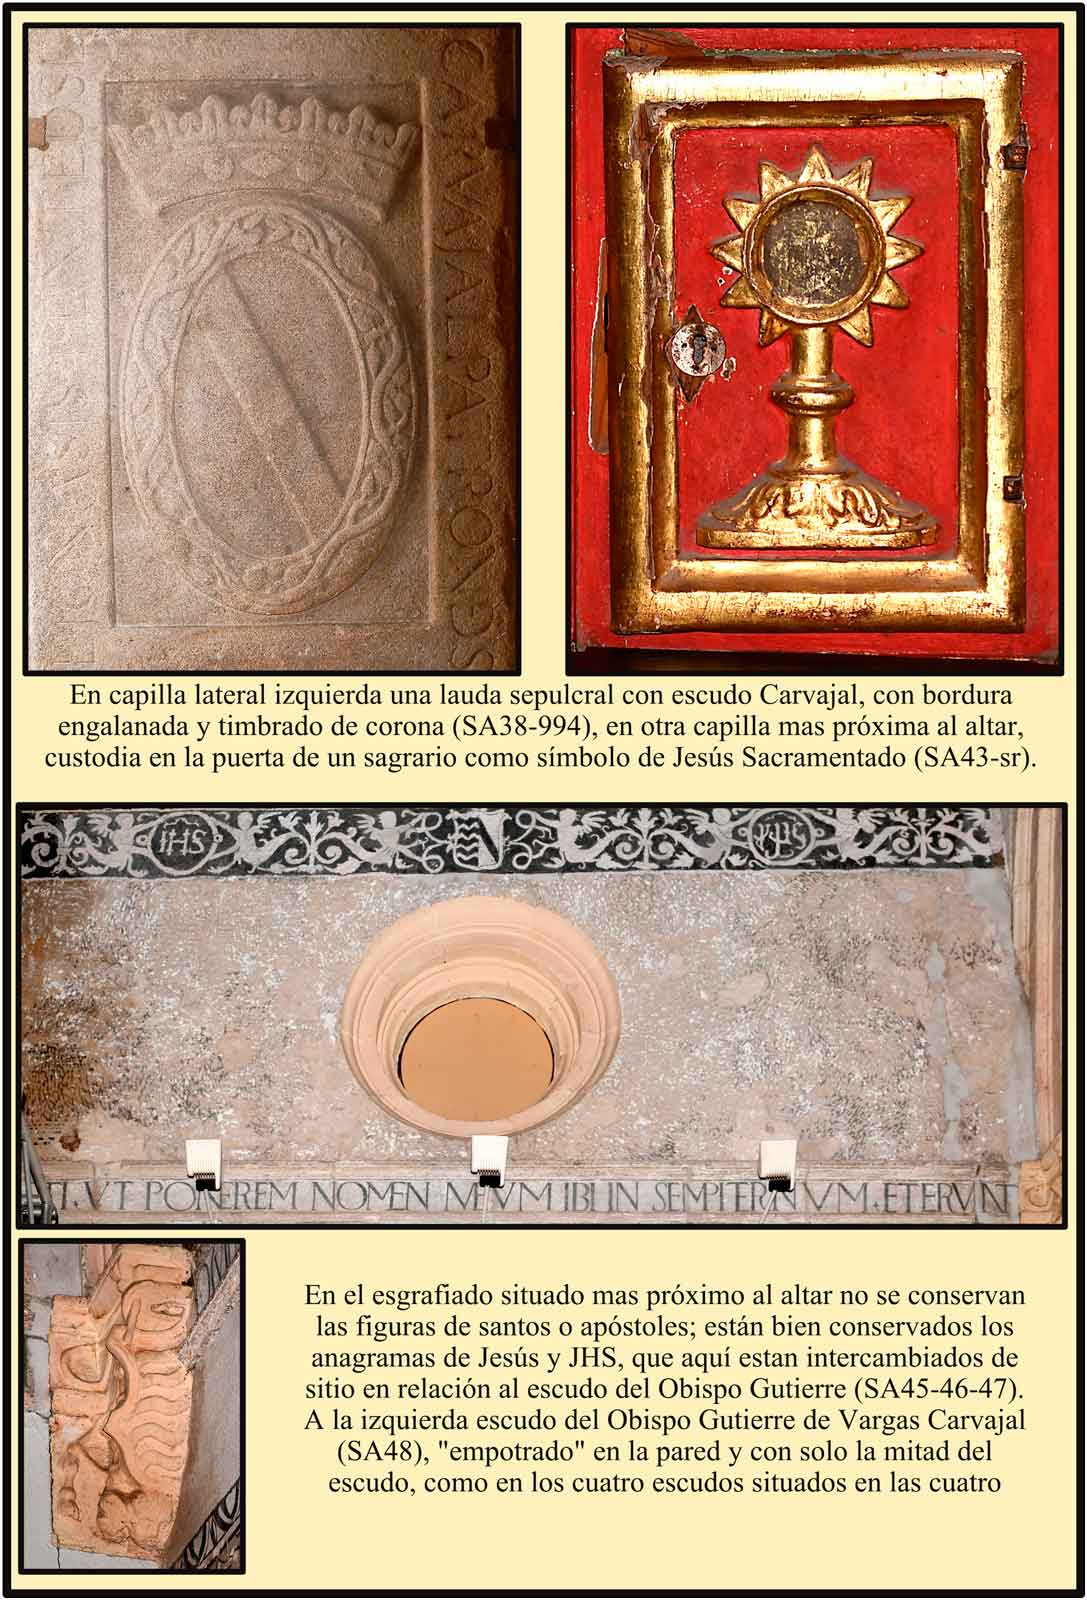 Santa Ana Lapida sepulcral con escudo de Carvajal custodia simbolo de Cristo